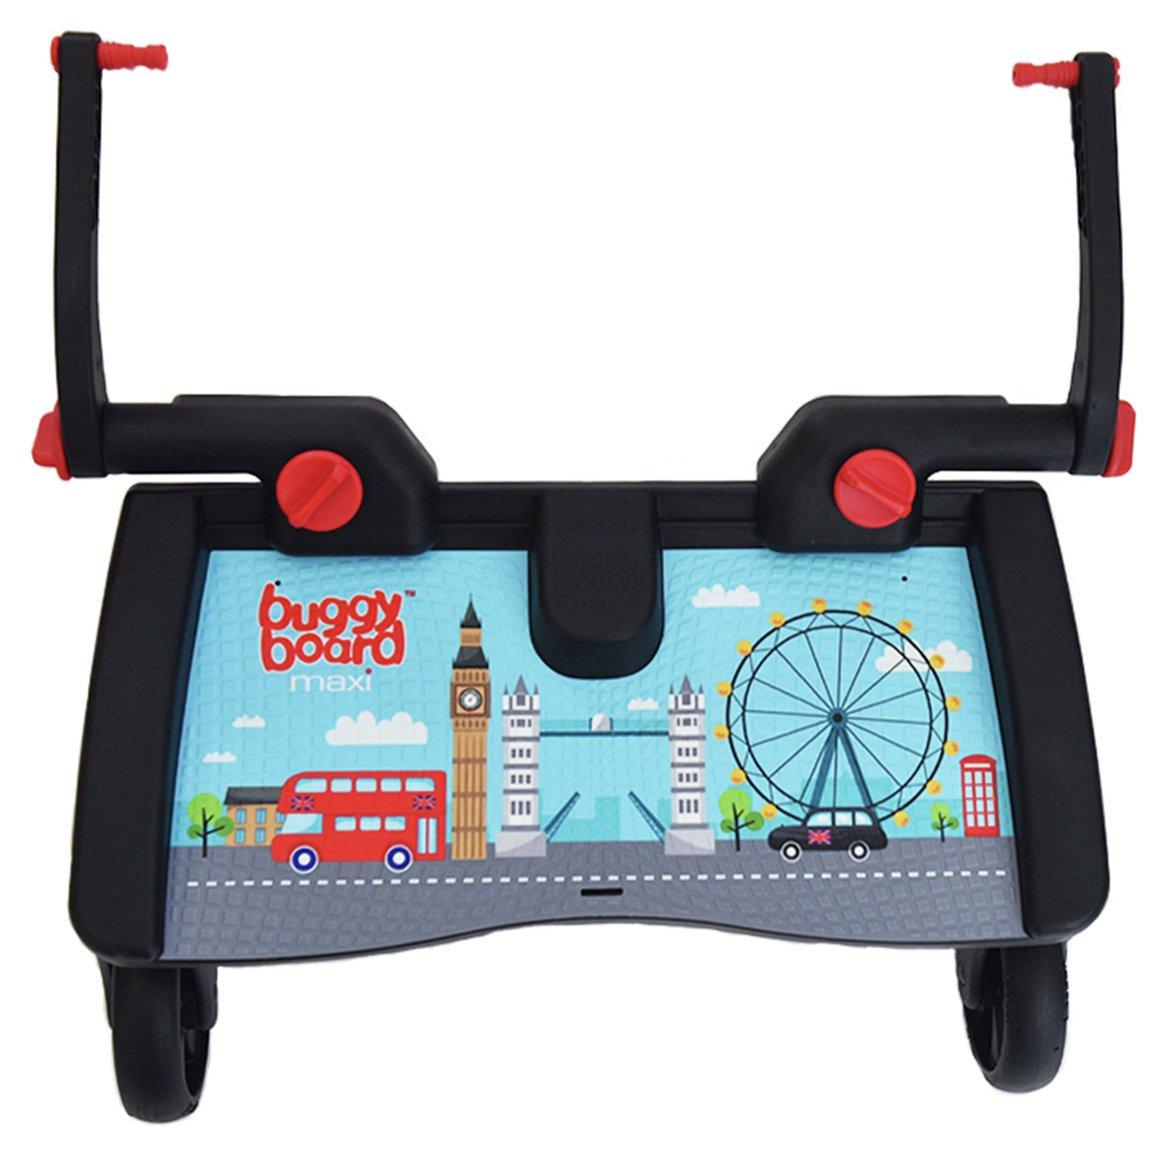 'Lascal Maxi Buggy Board